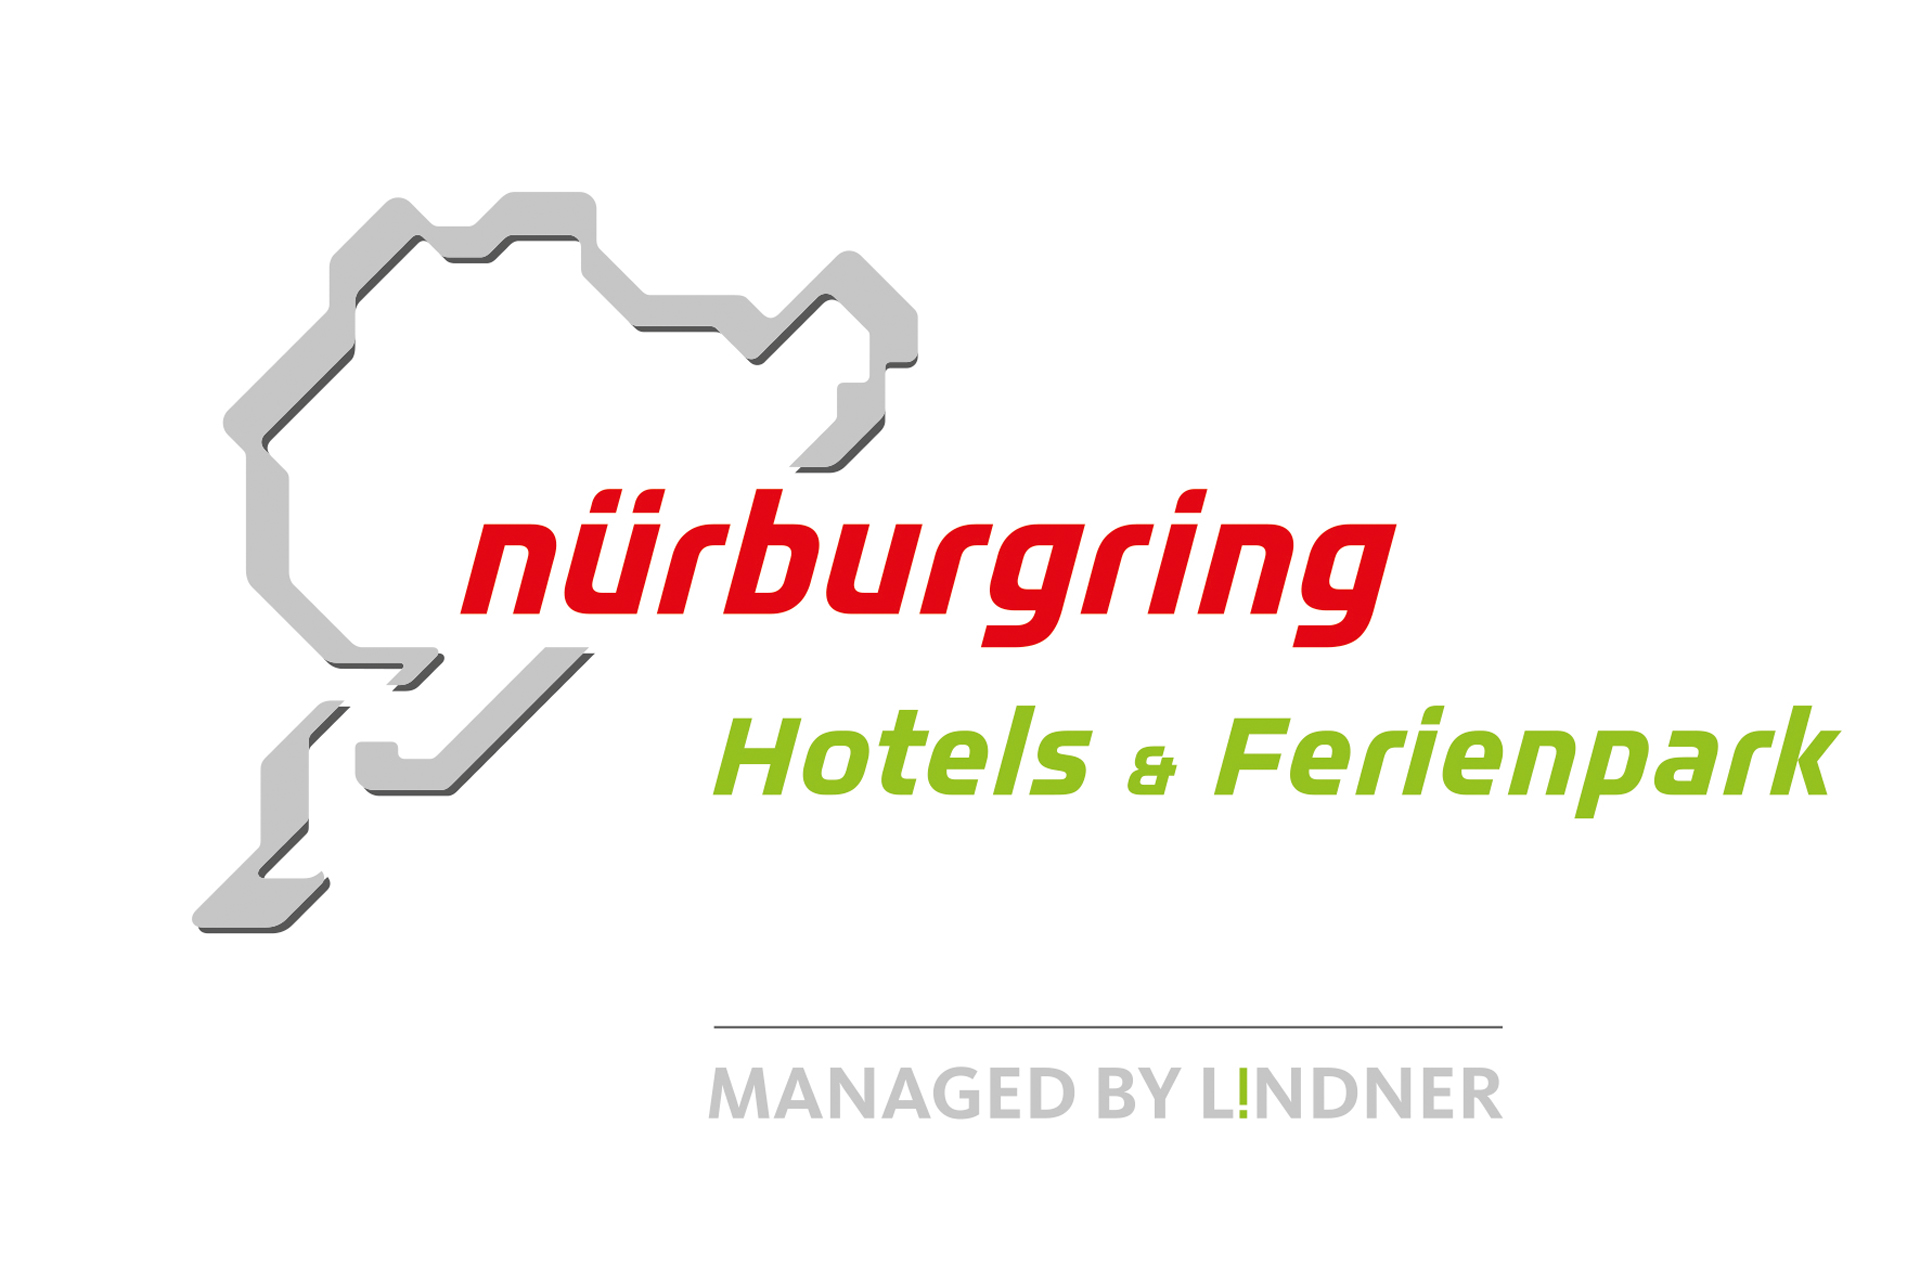 NBR_Hotels&Ferienpark_4c